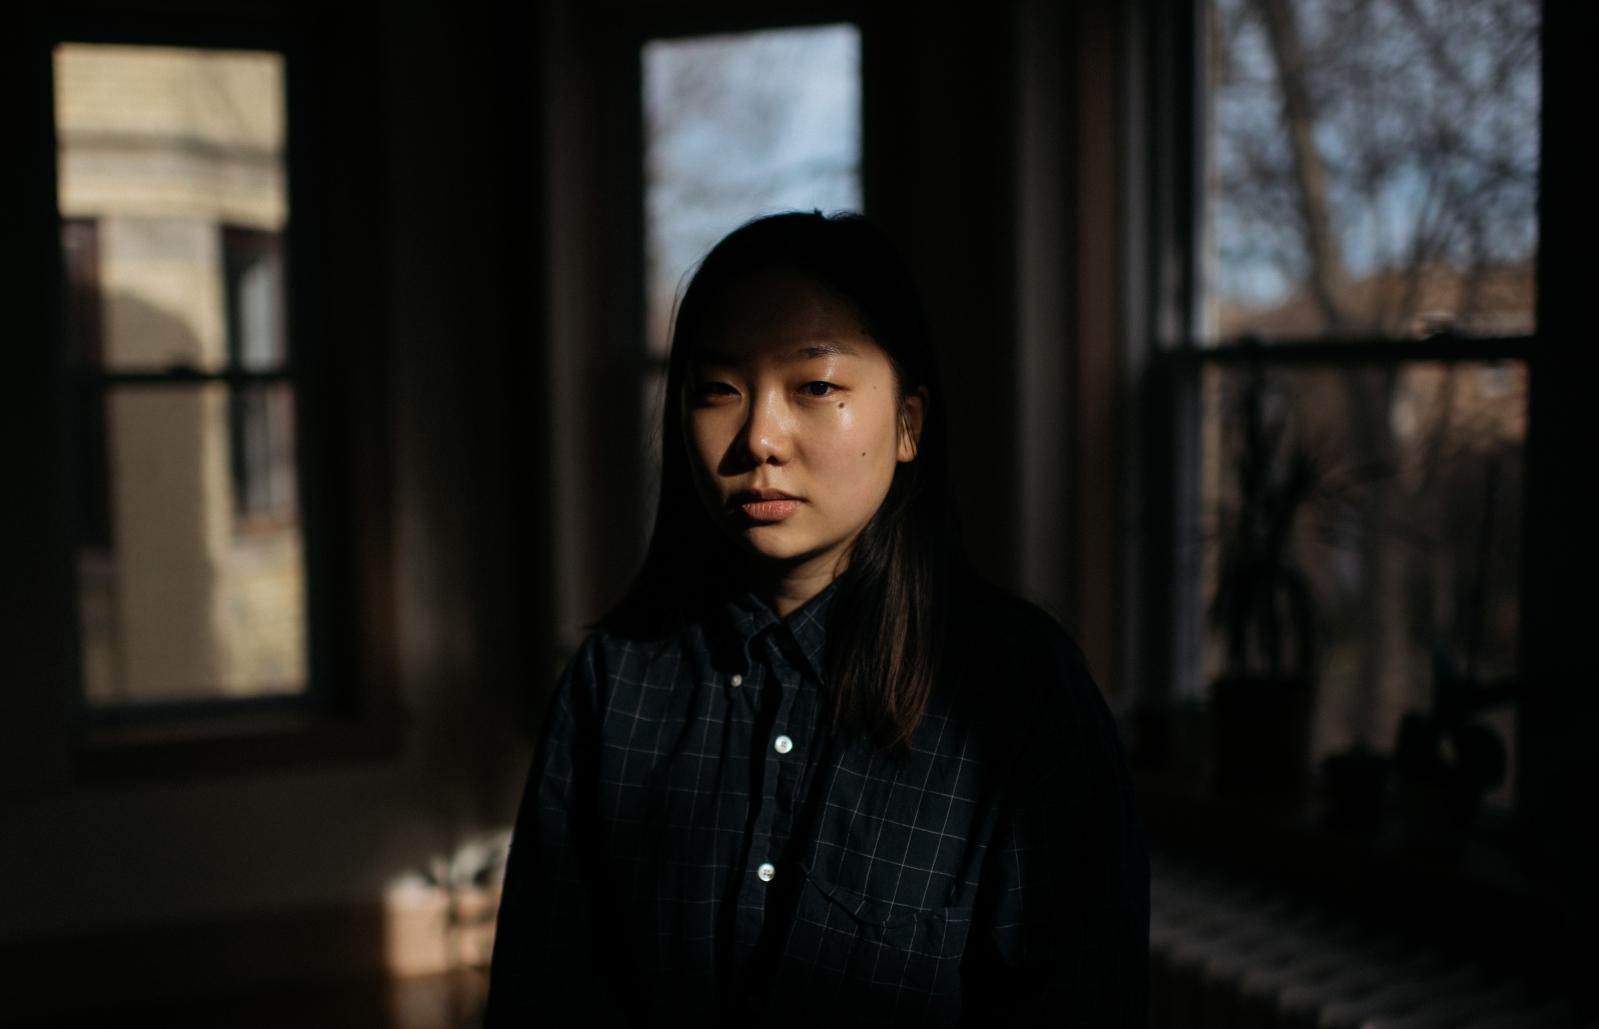 Josephine Wang. Chicago, Illinois. 2017